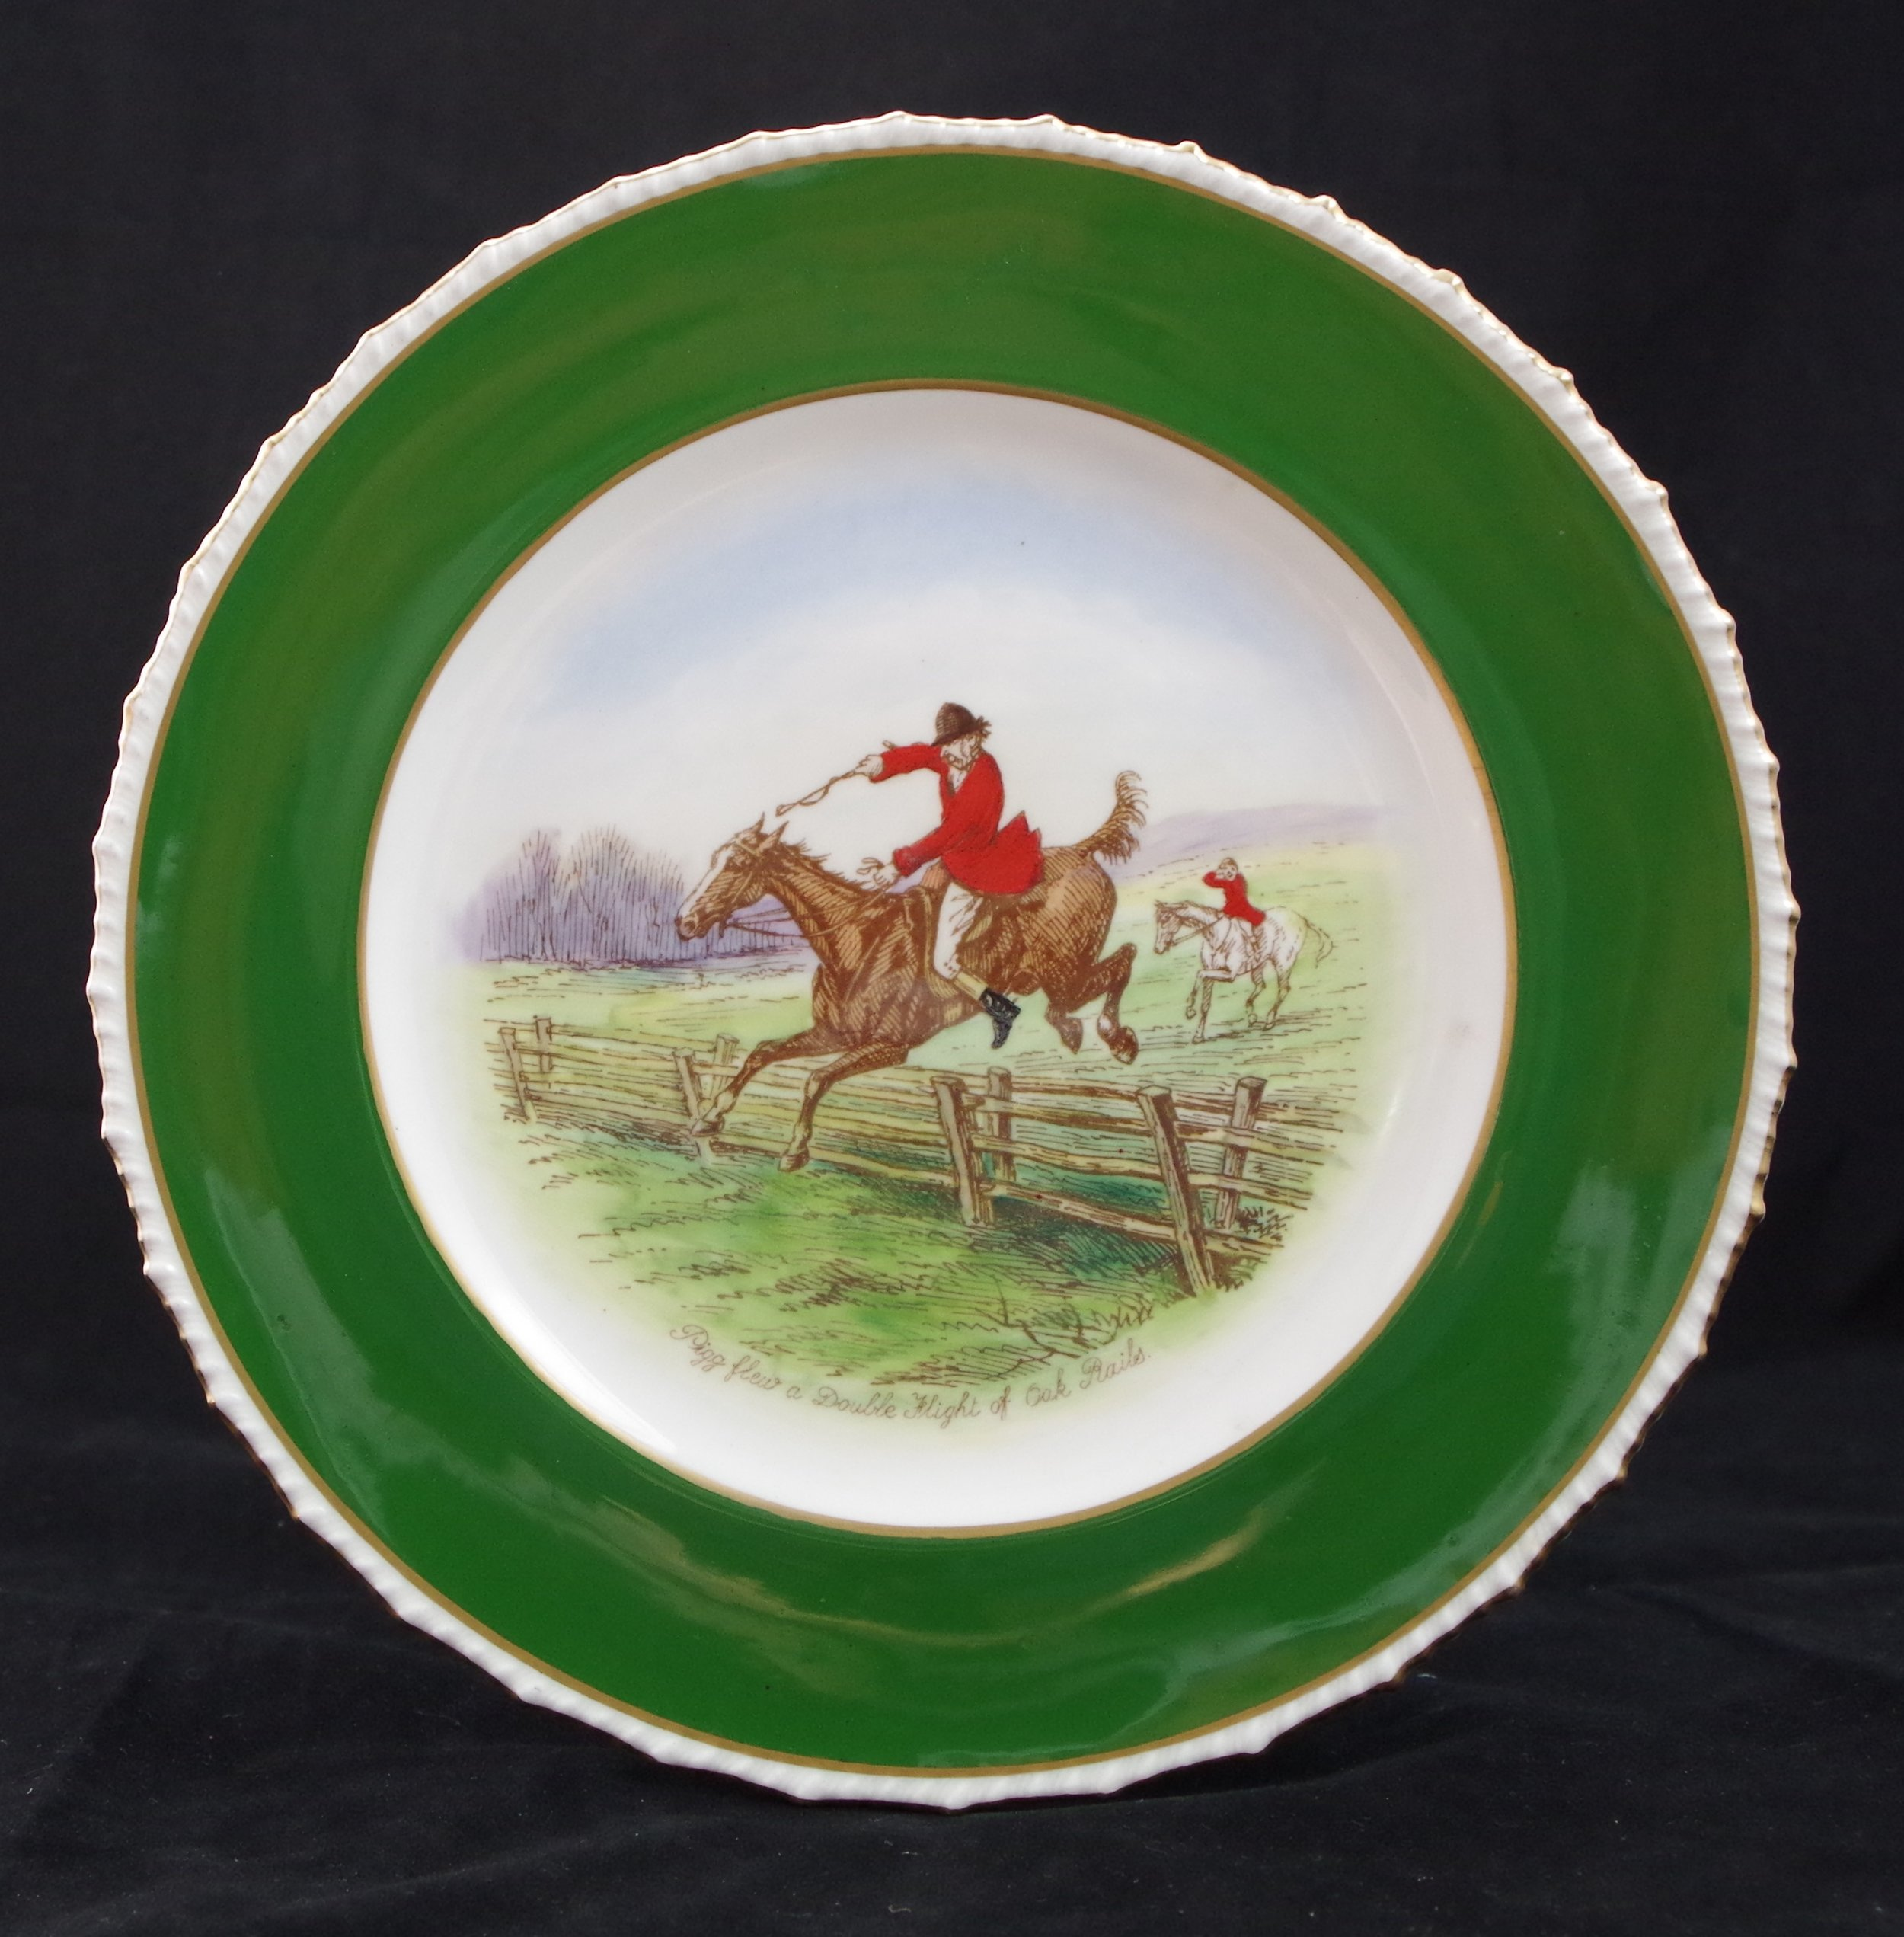 royal-crown-derby-stanhope-siam-green-ground-jorrocks-2